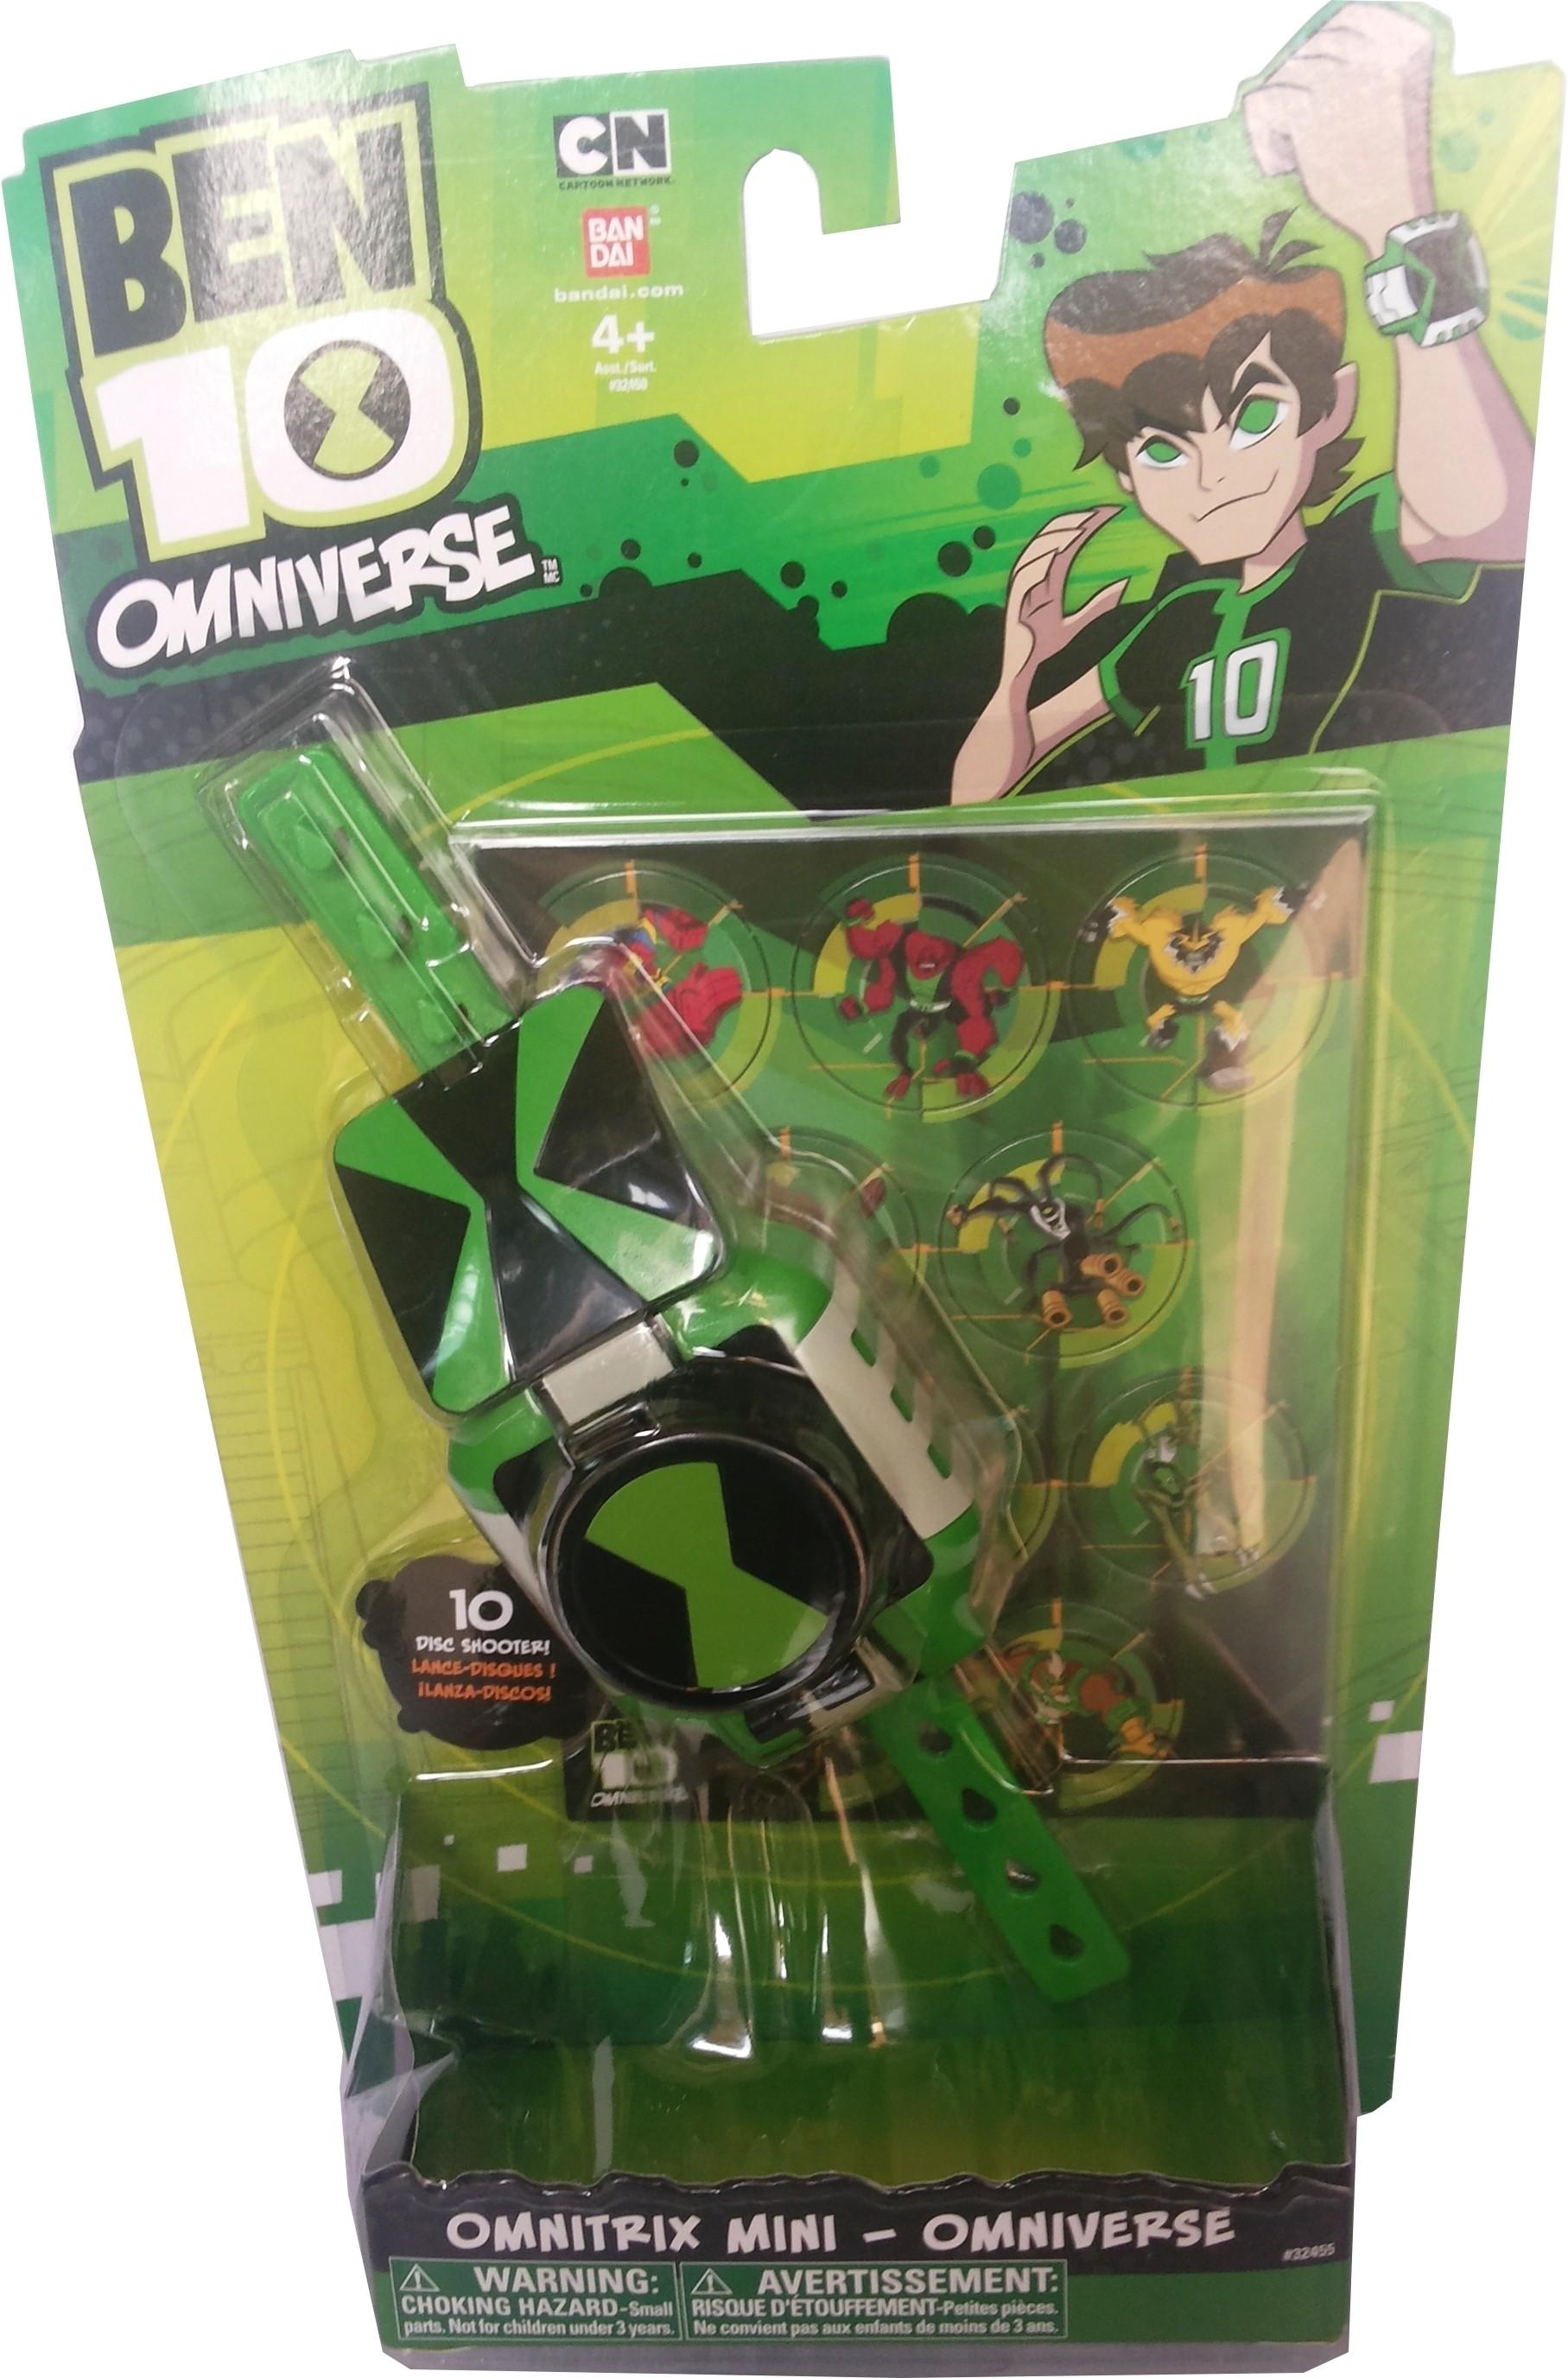 Ben 10 Omnitrix Mini - Omniverse - Omnitrix Mini ...